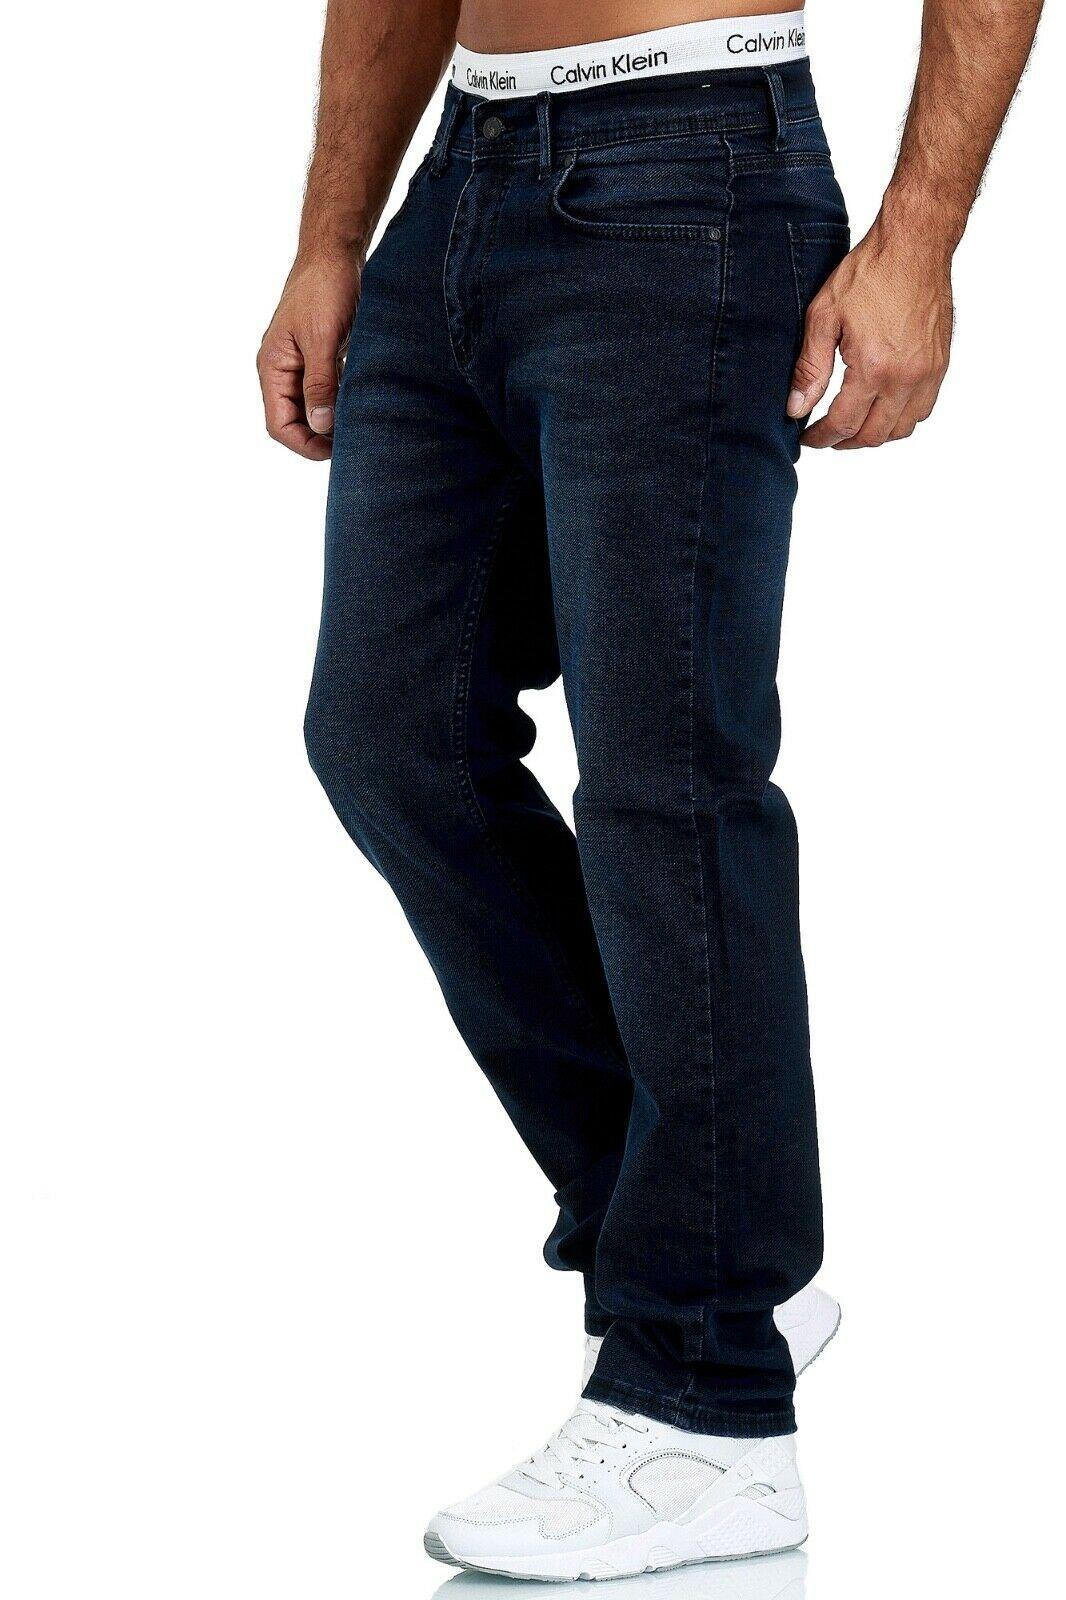 Herren-Jeans-Hose-Denim-KC-Black-Washed-Straight-Cut-Regular-Dicke-Naht-naehte Indexbild 87